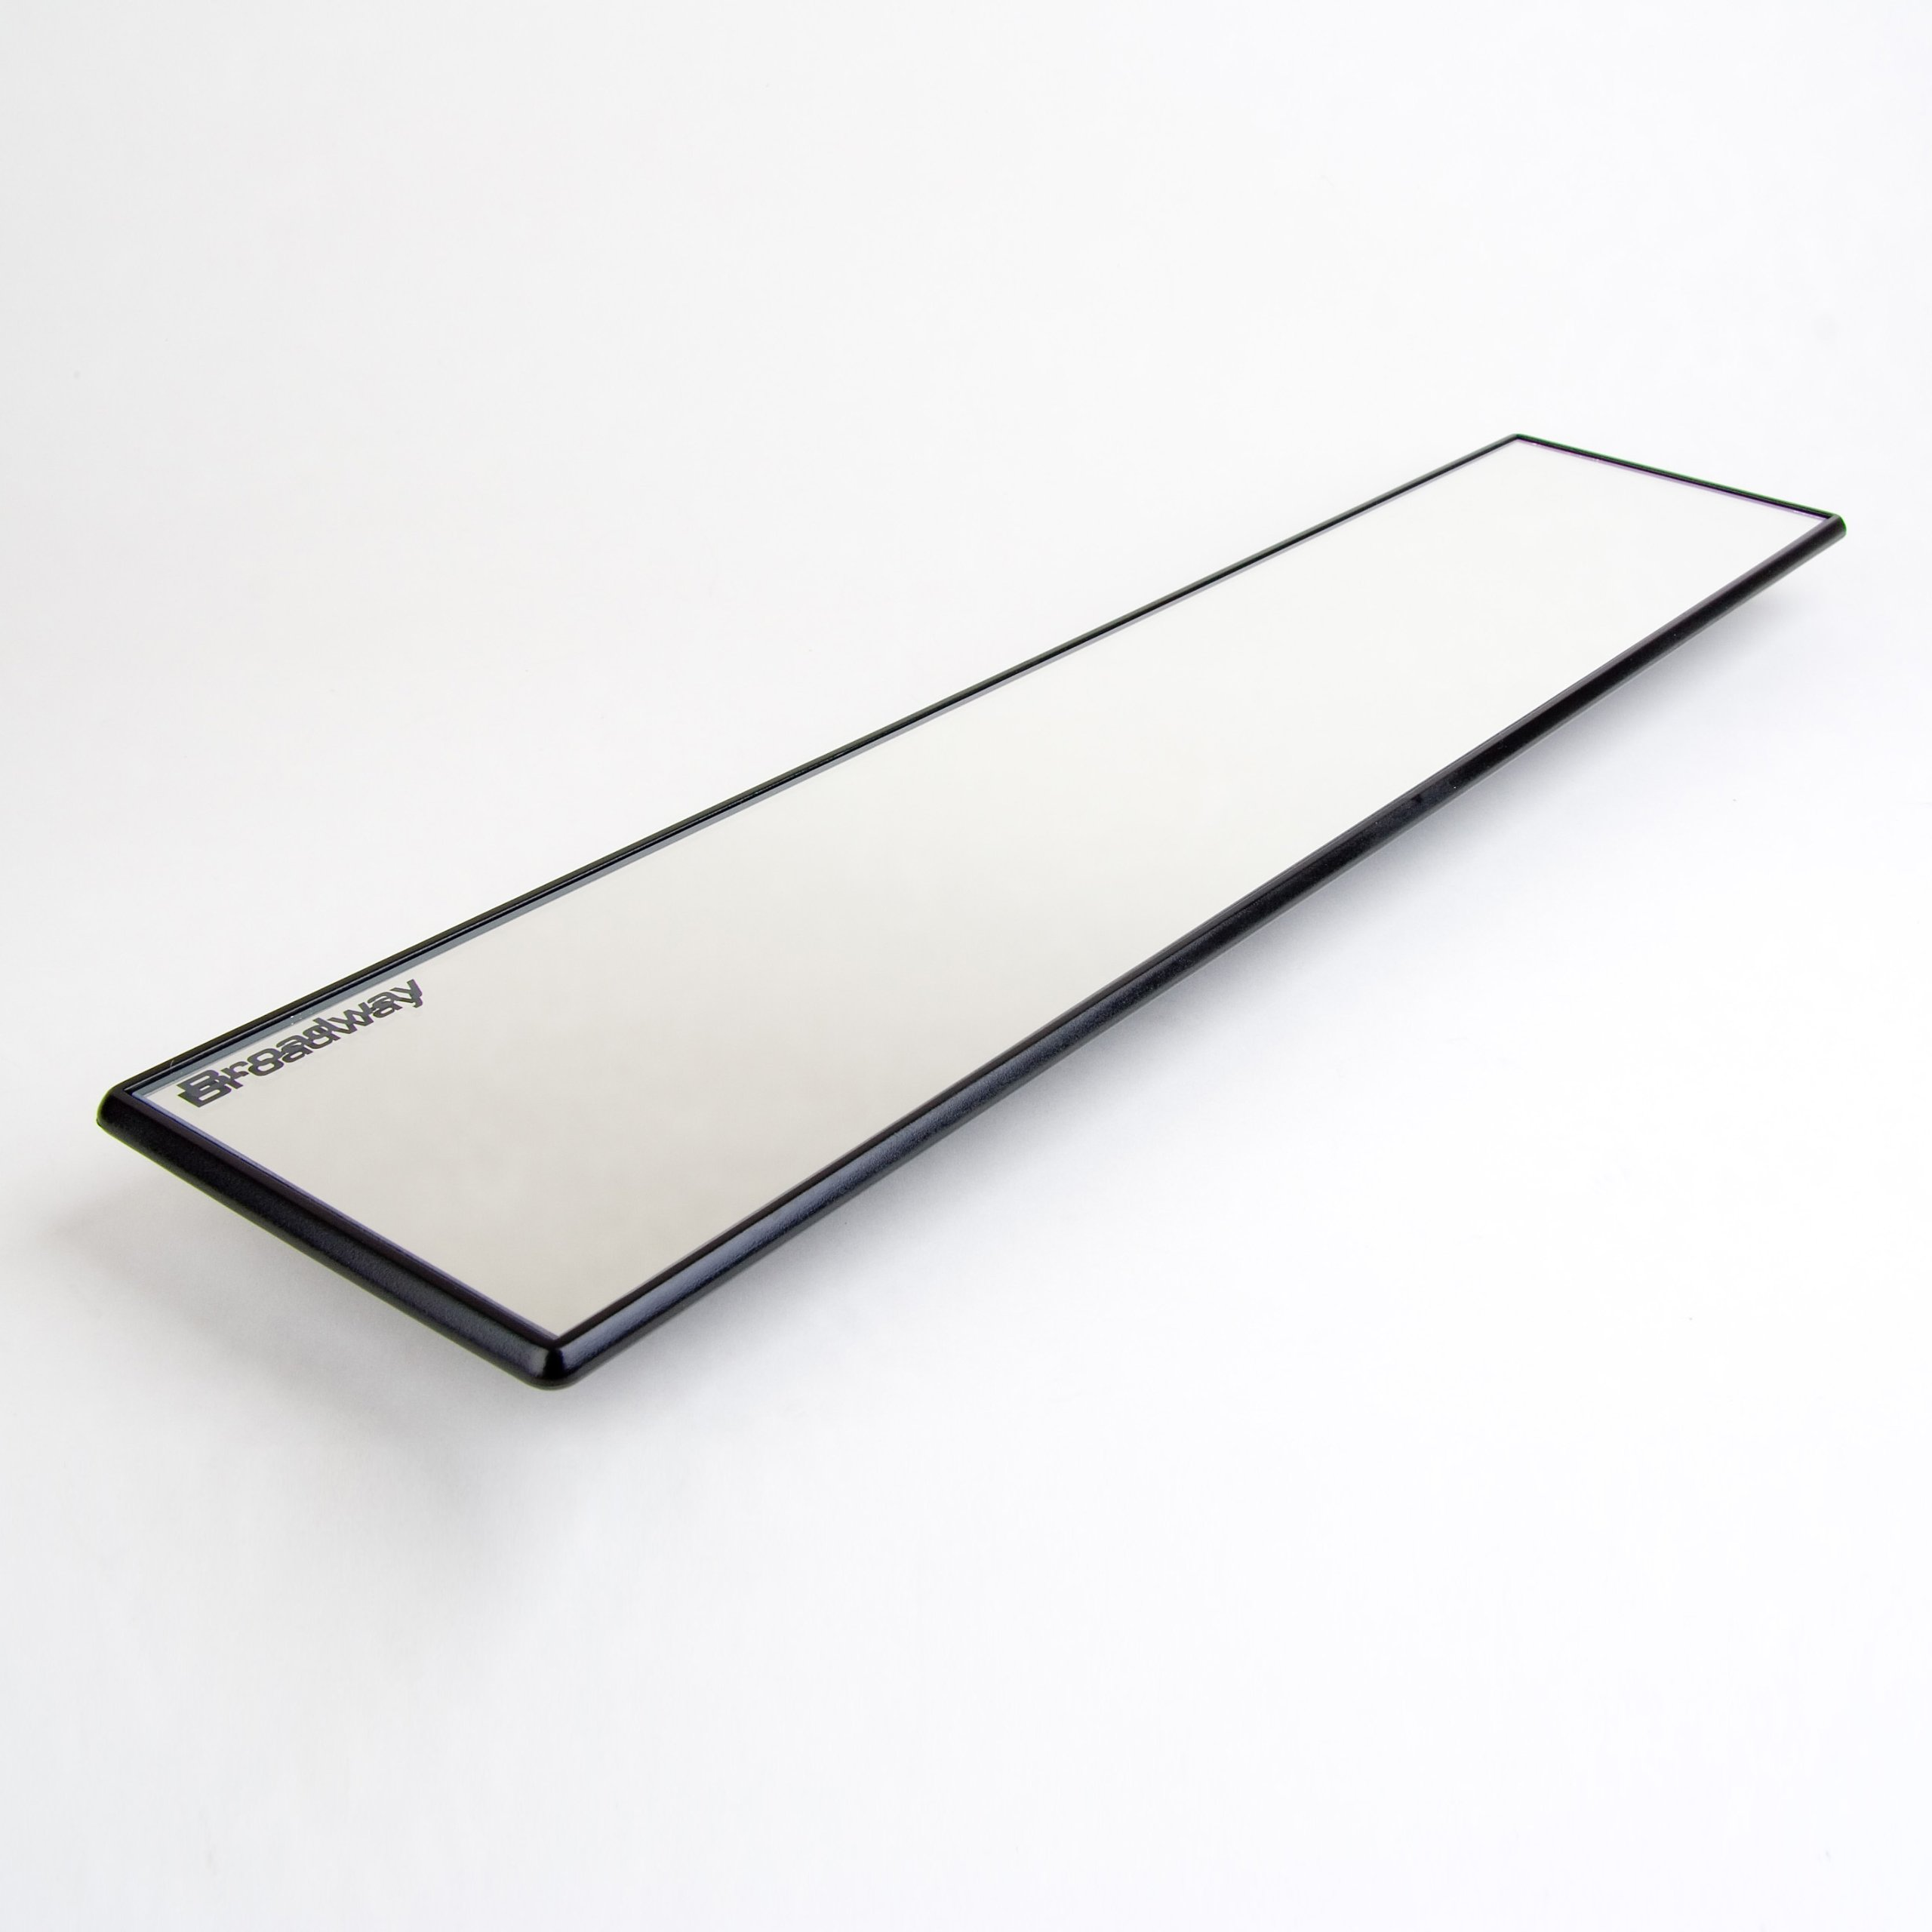 Broadway BW848 360mm Type-A Flat Mirror